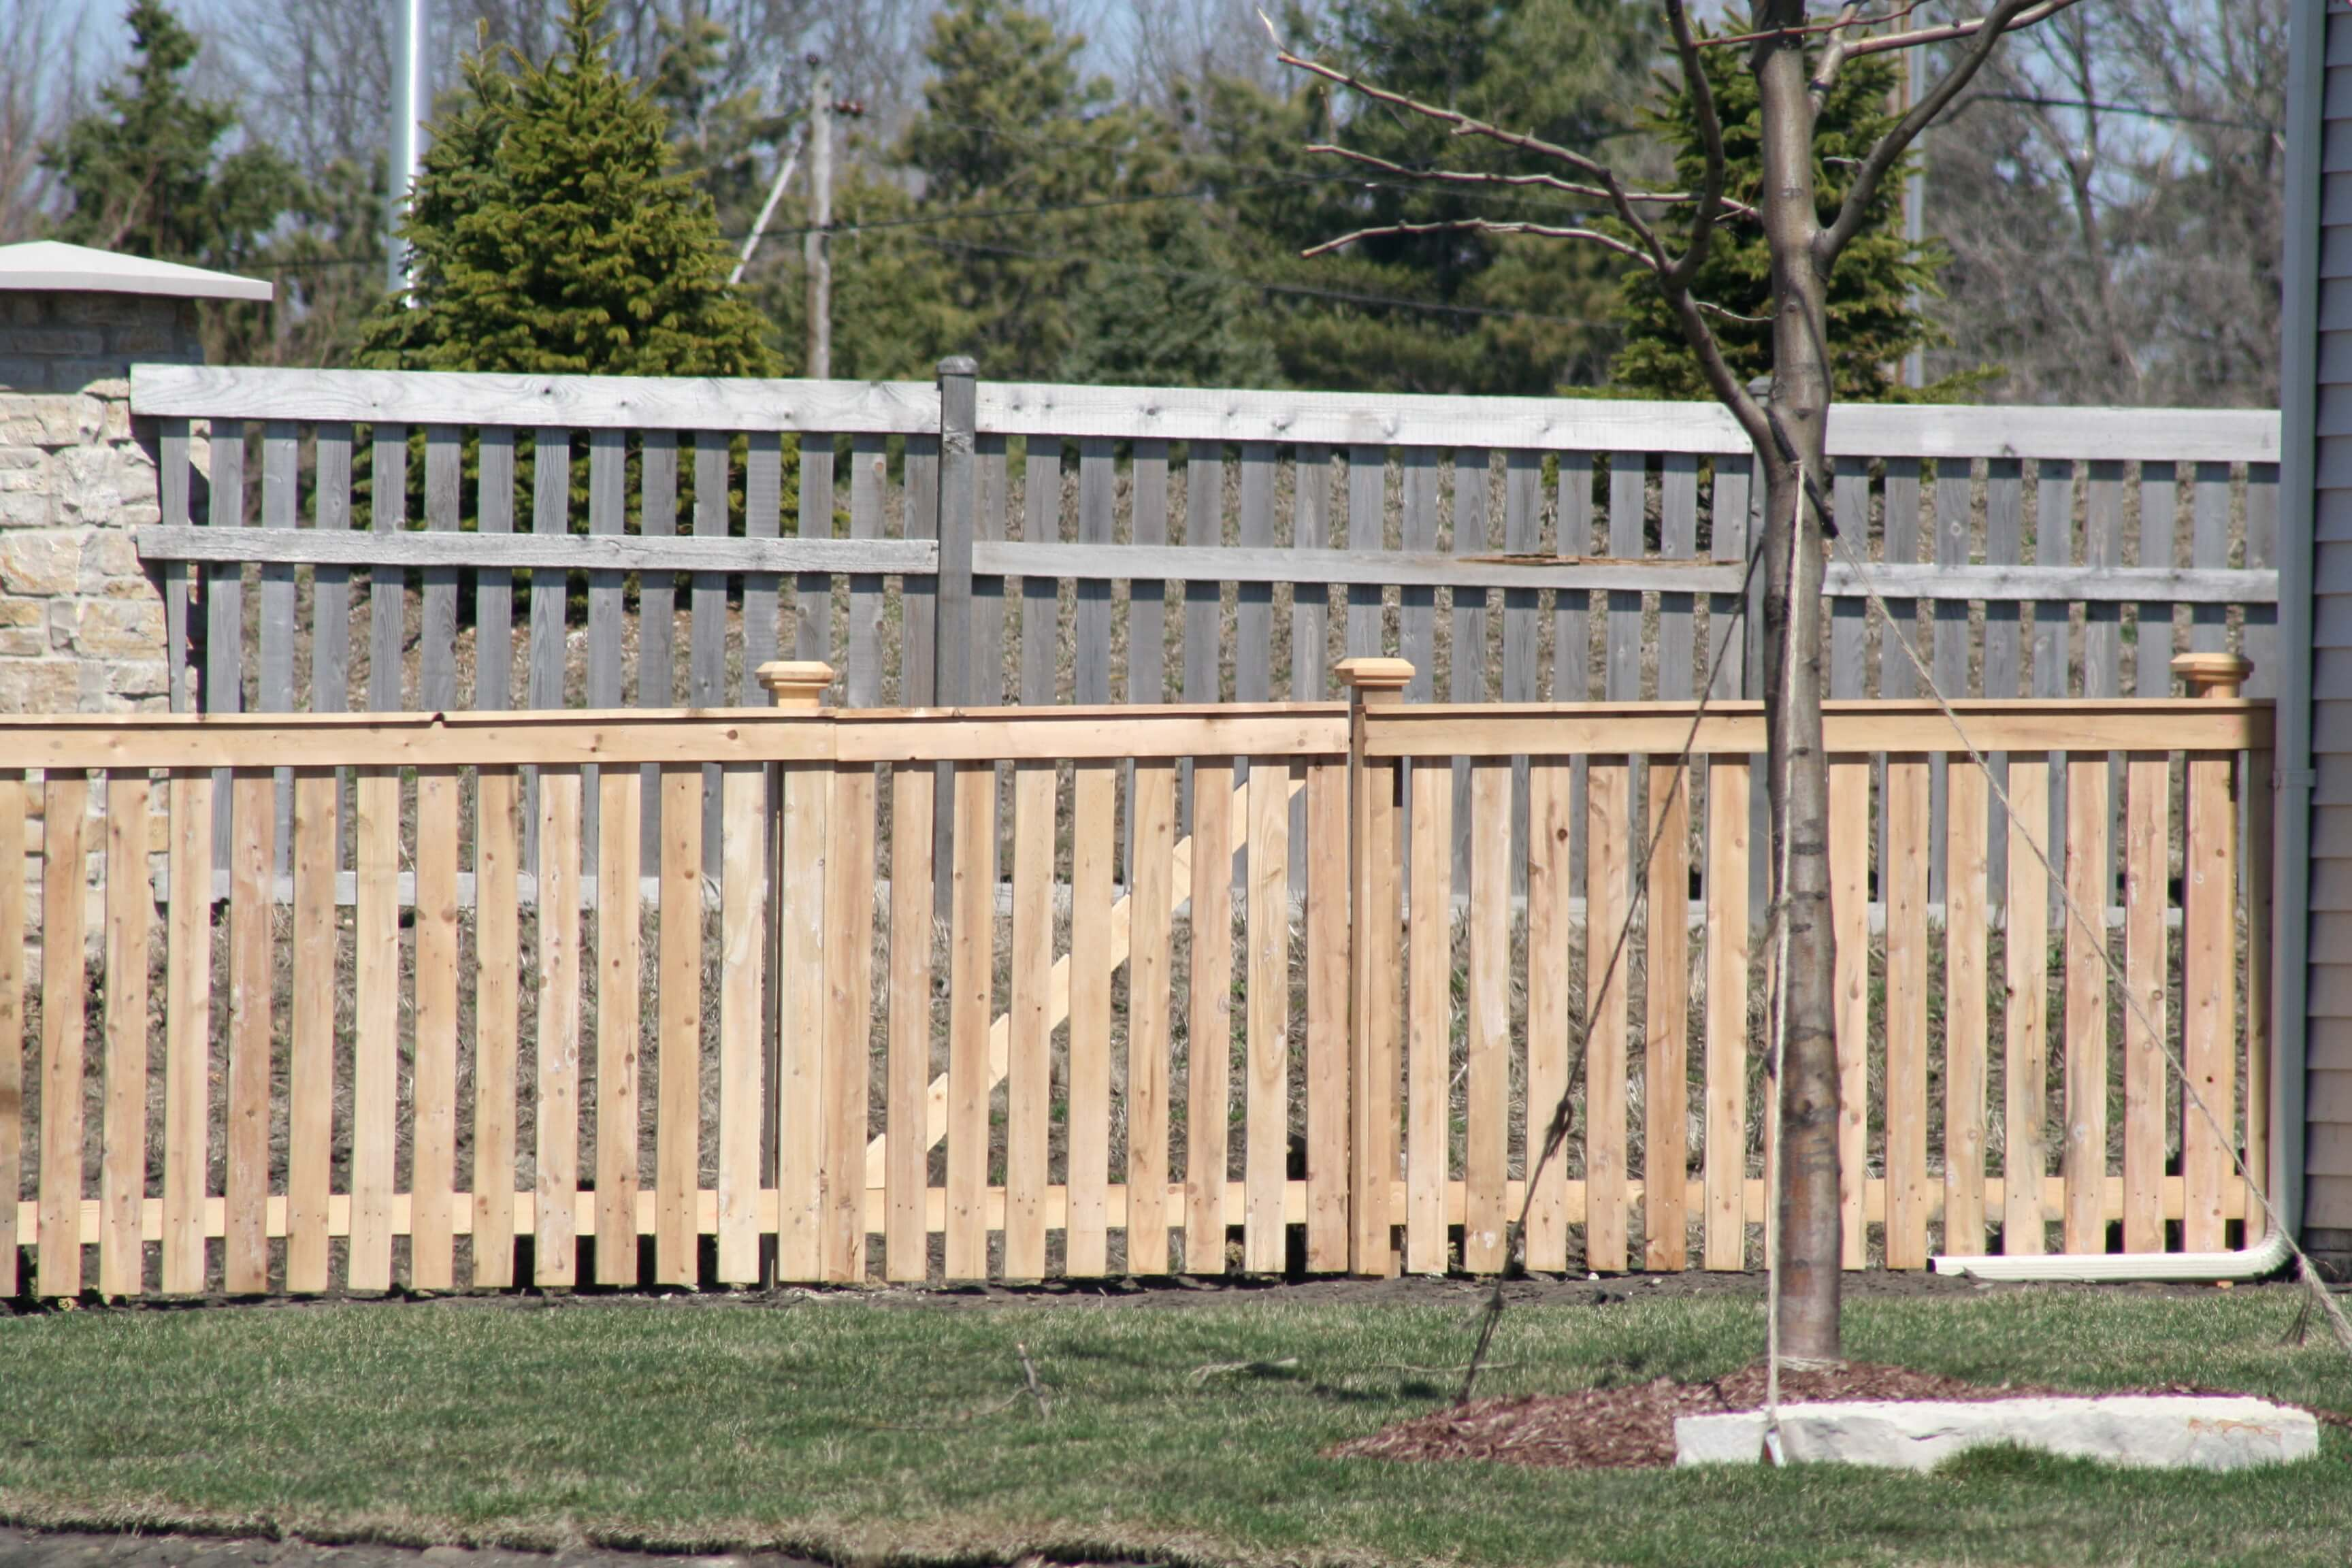 Spaced Cedar Fences Joliet IL America s Backyard